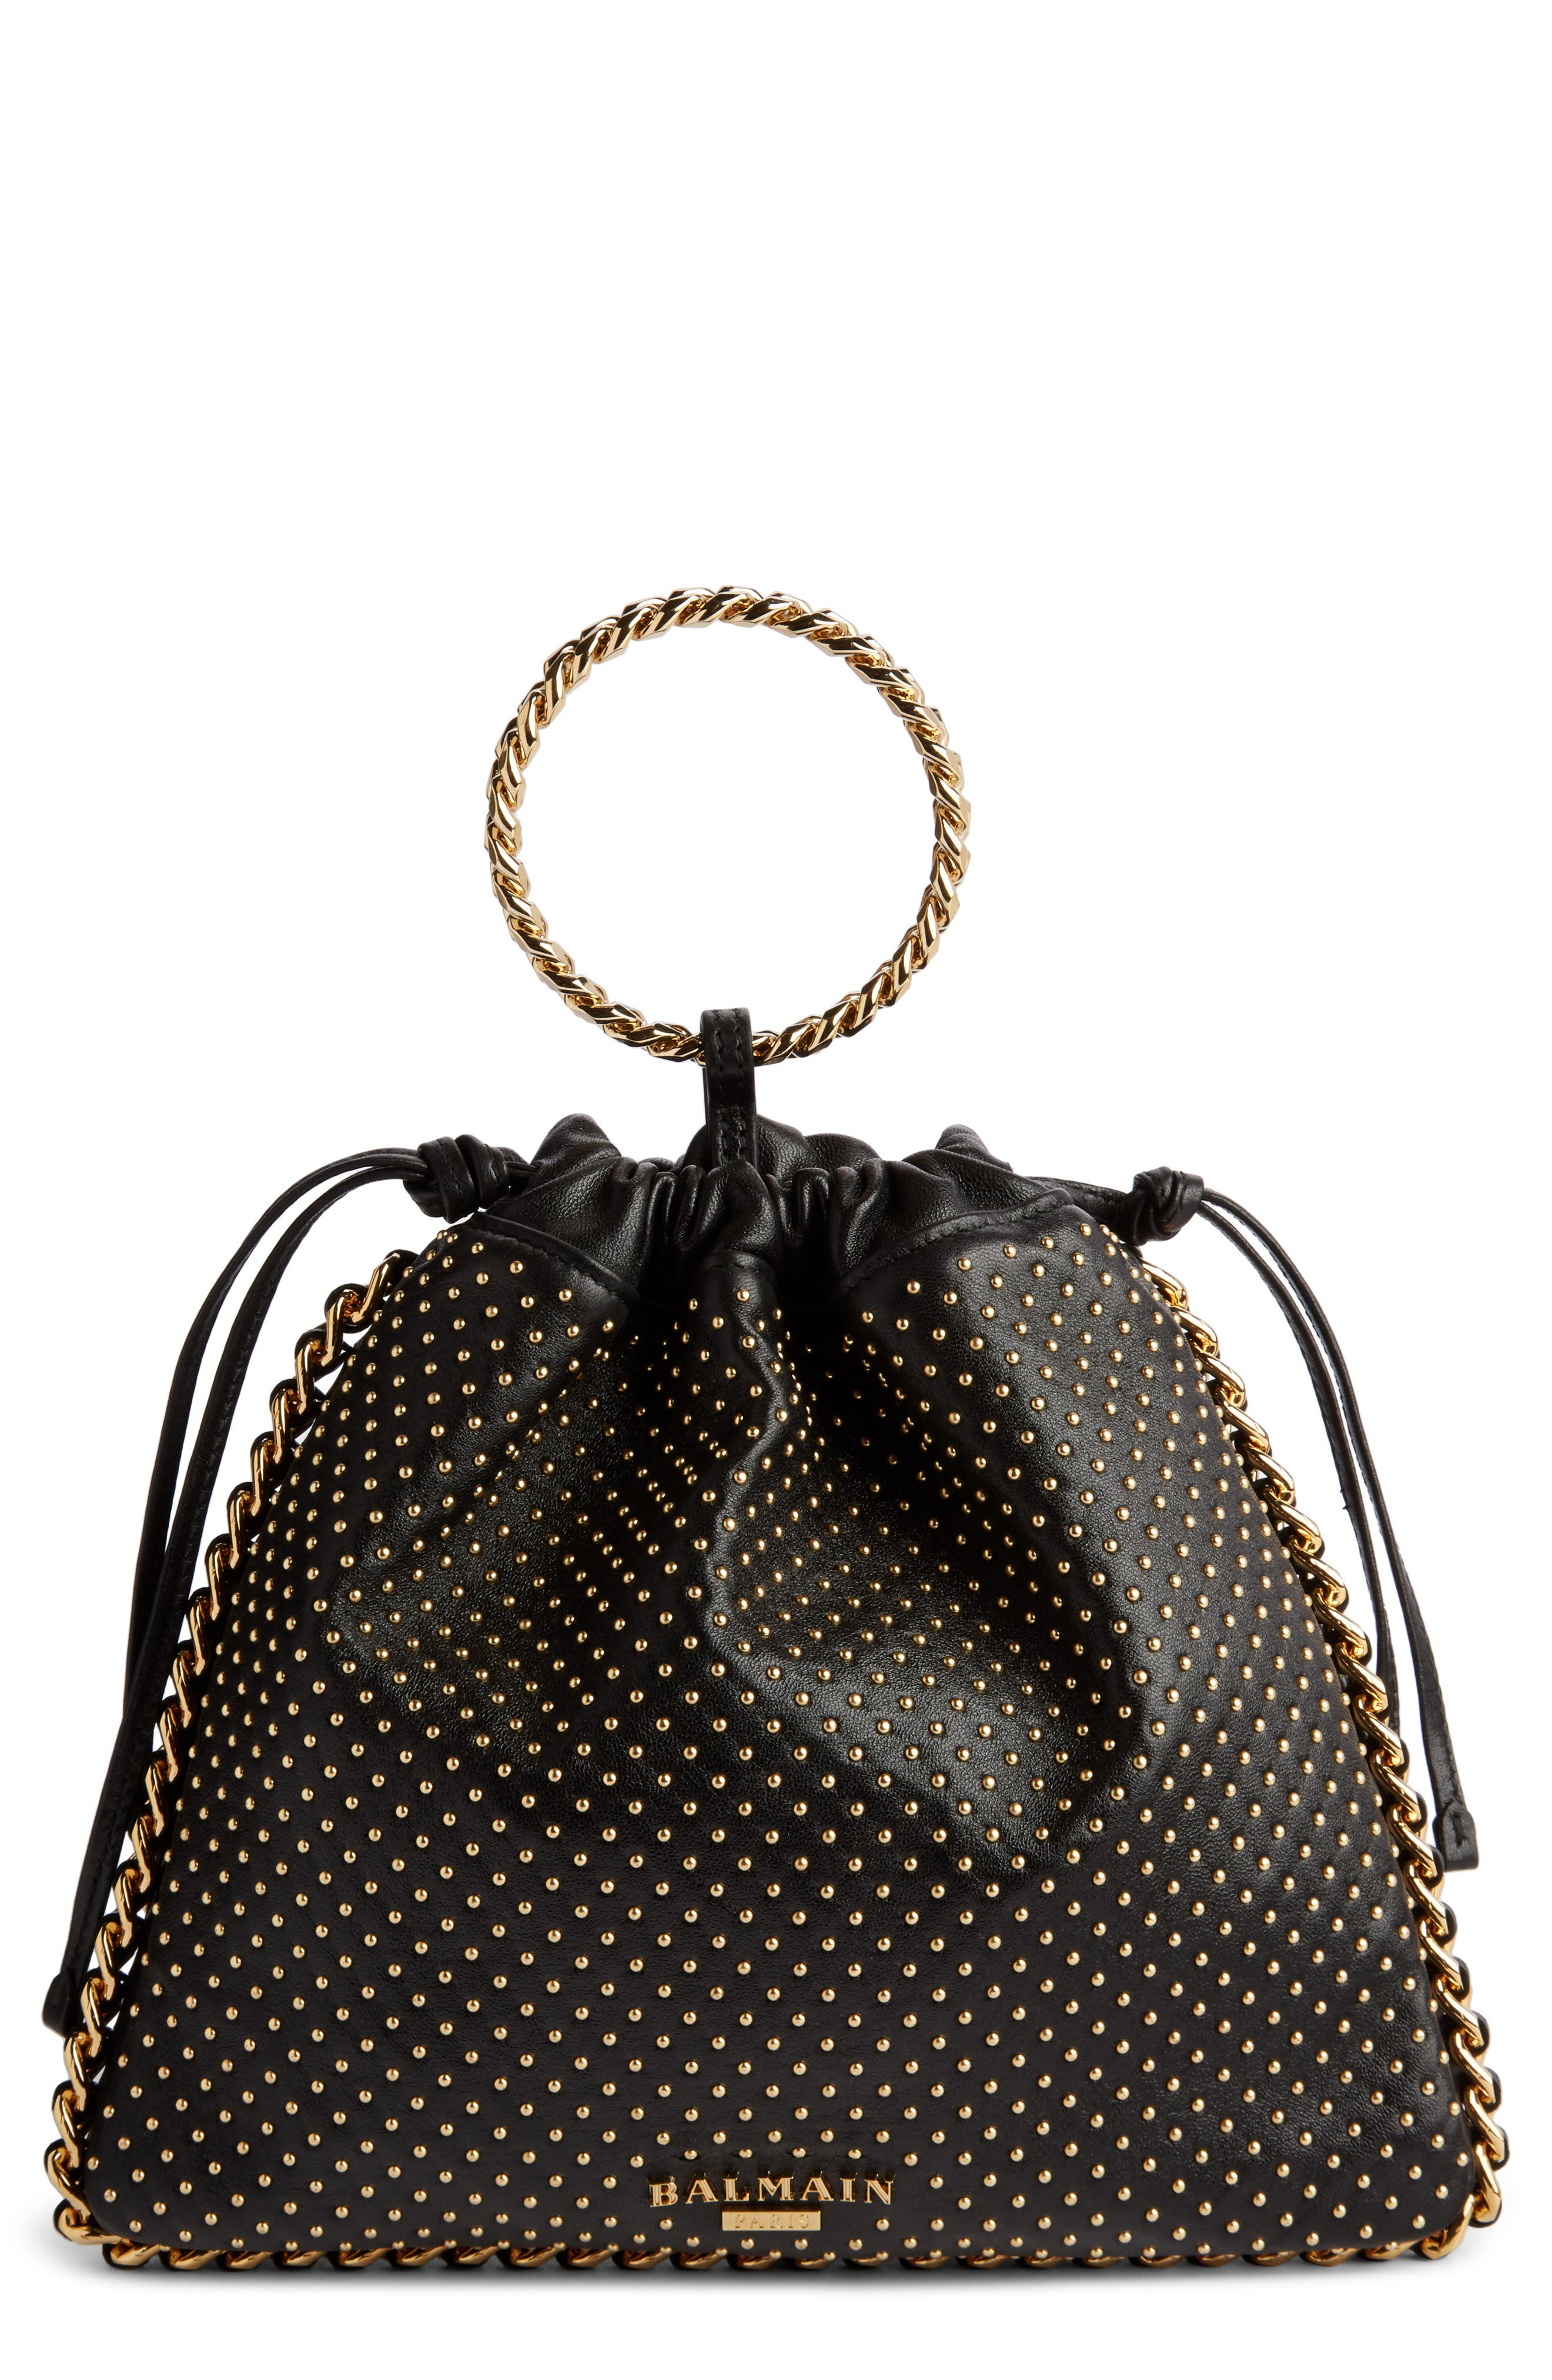 Balmain Studded Leather Bracelet Backpack